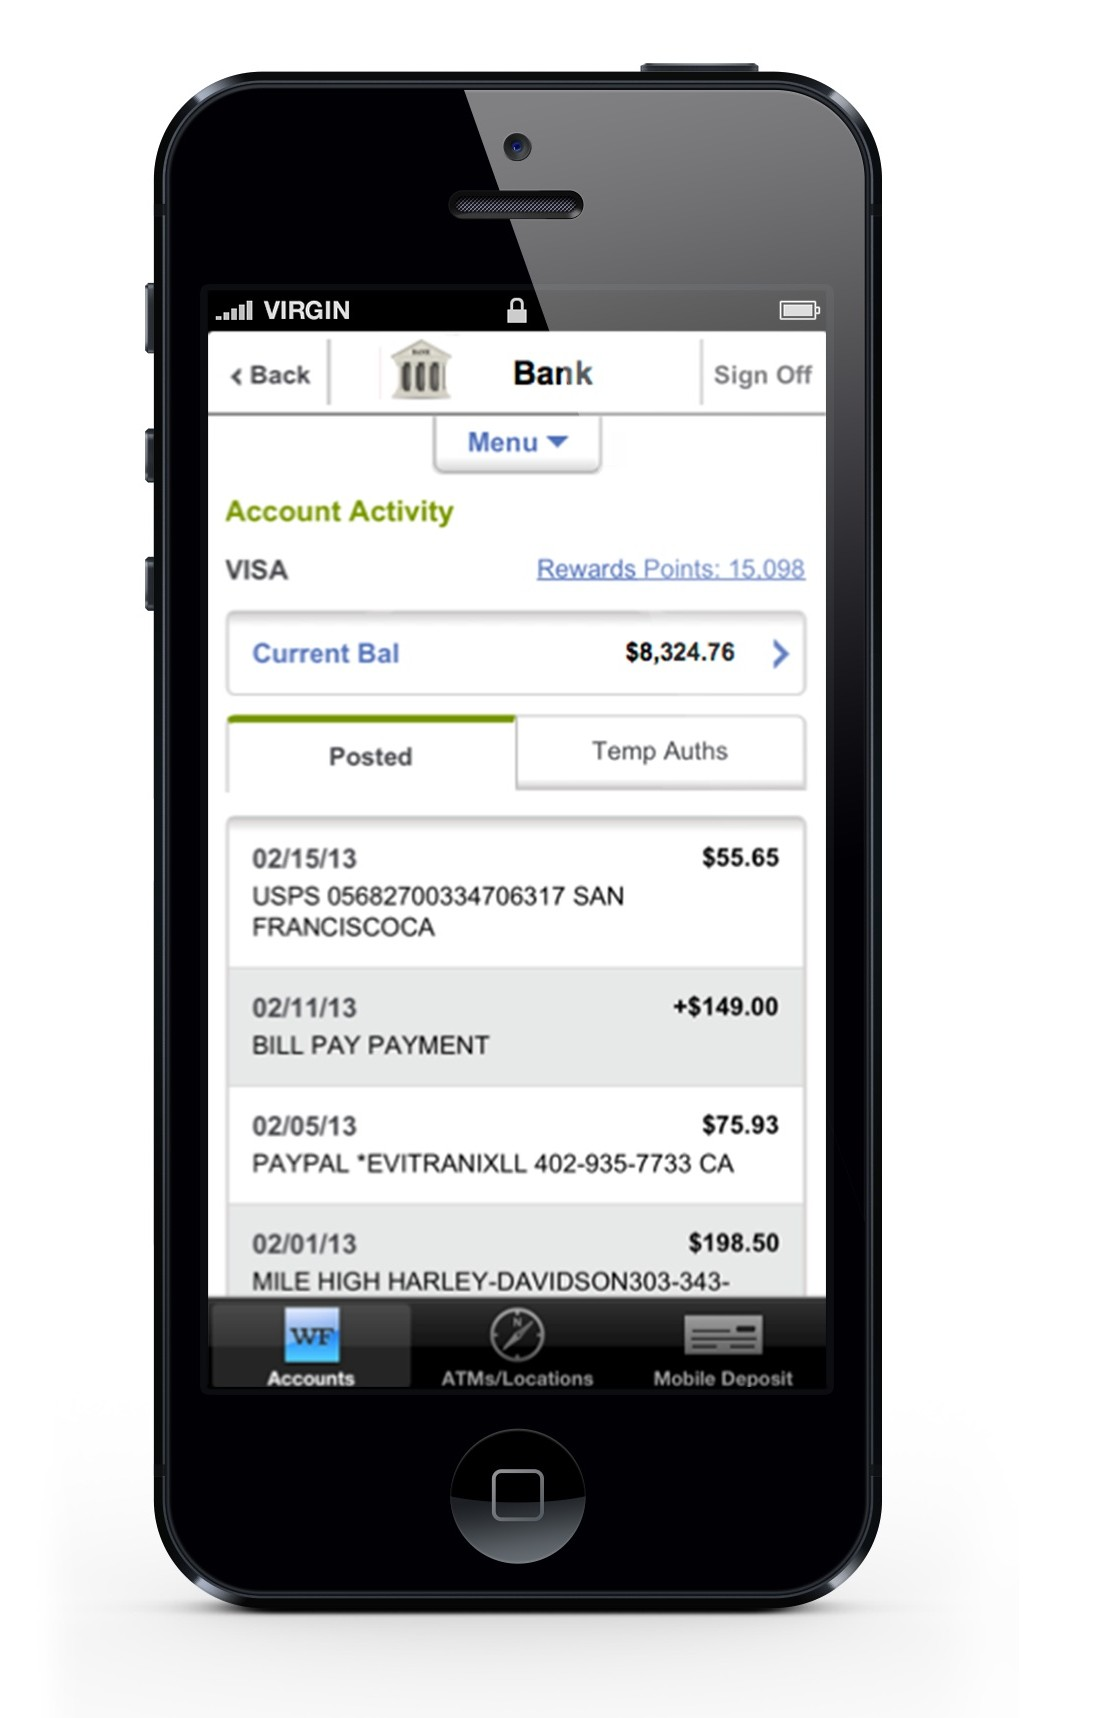 fake_bank_screenshot_NoChat_in_iPhone5